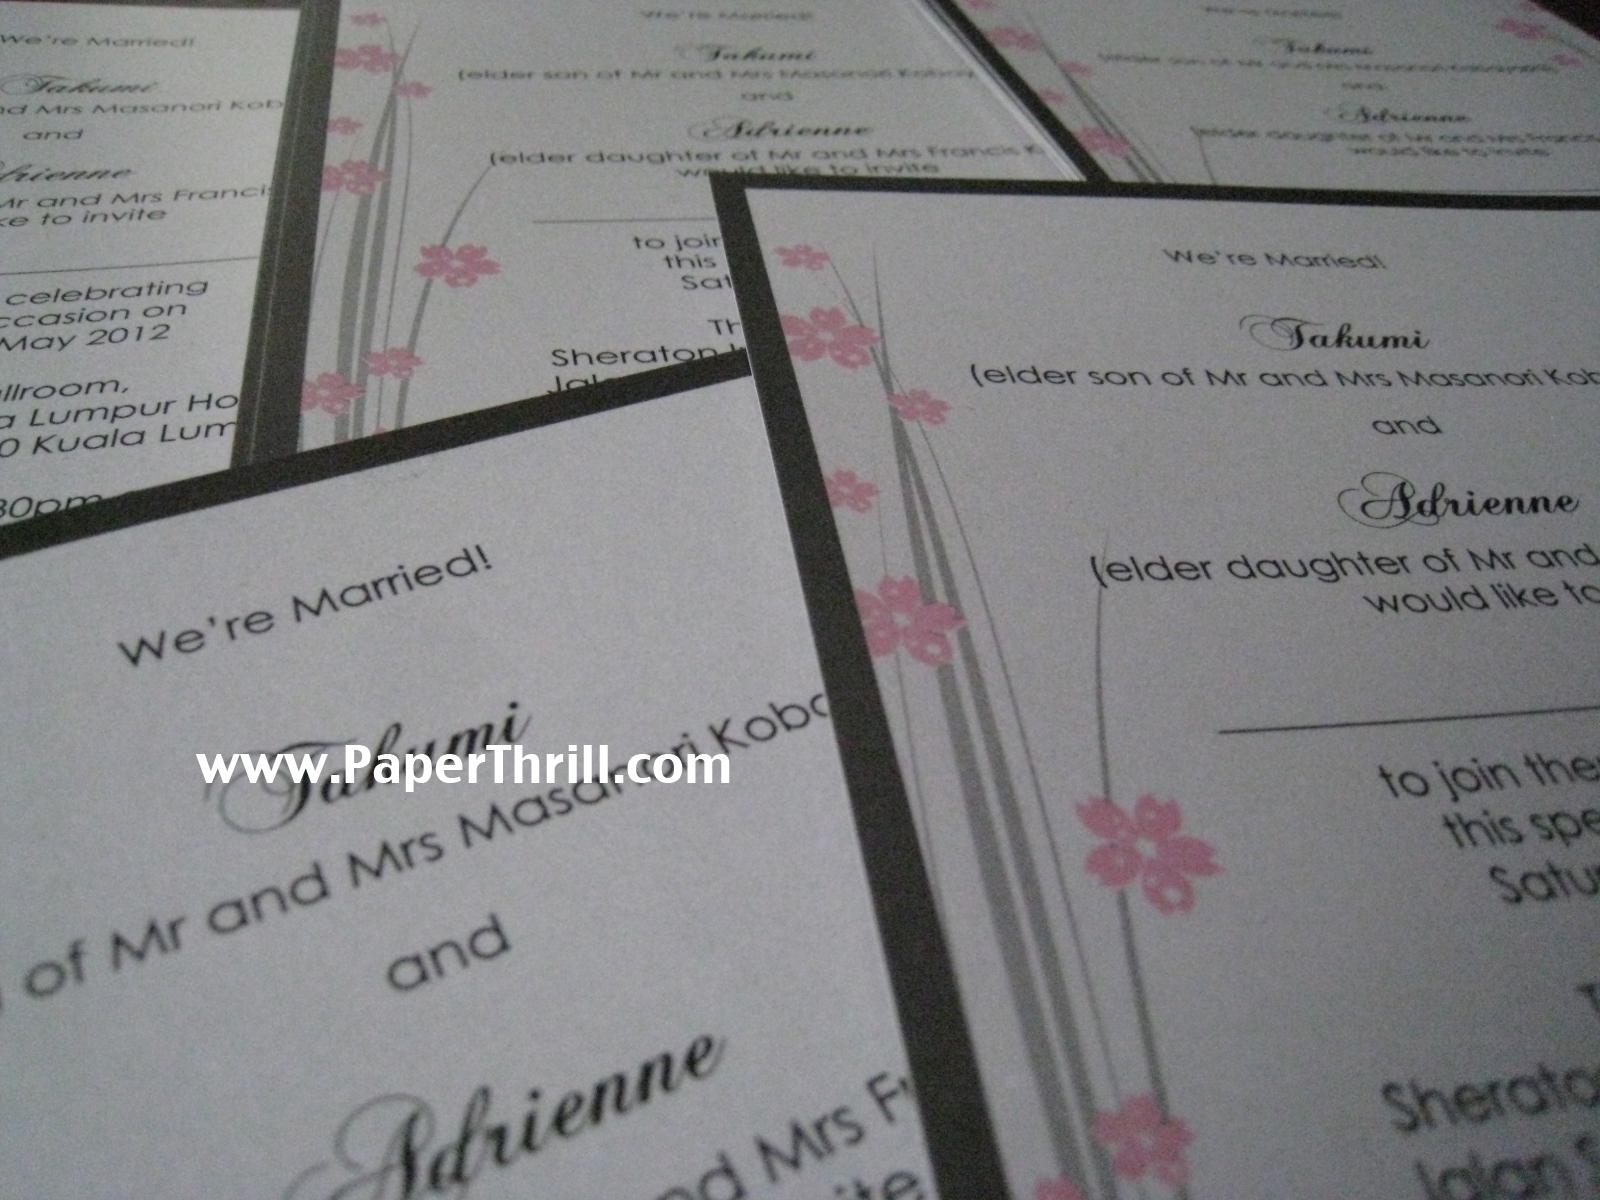 Adrienne\'s japanese wedding invitations | Malaysia wedding ...